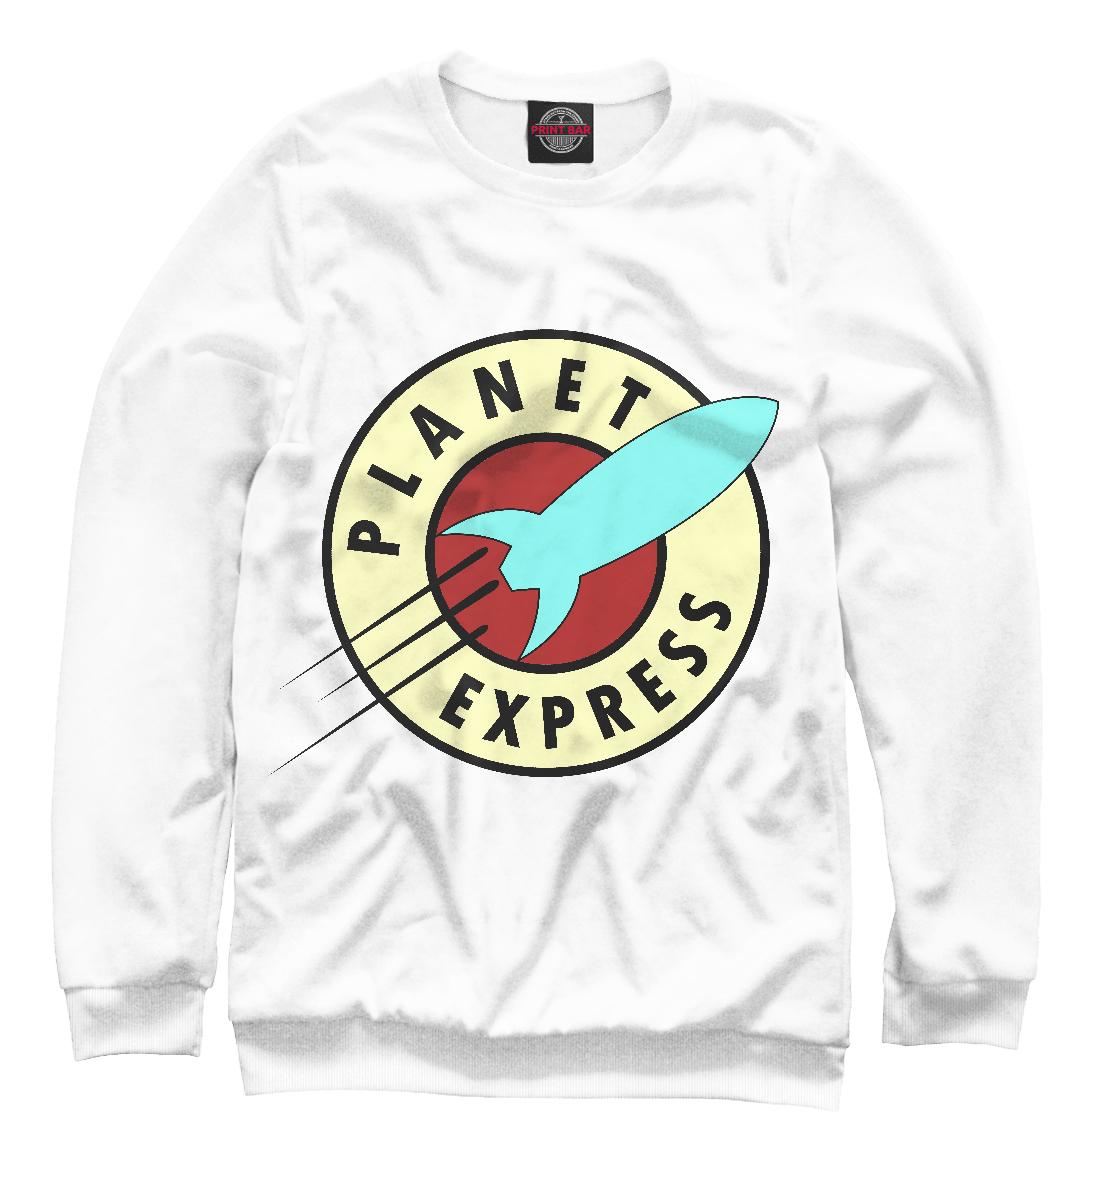 Фото - Planet Express carbon express